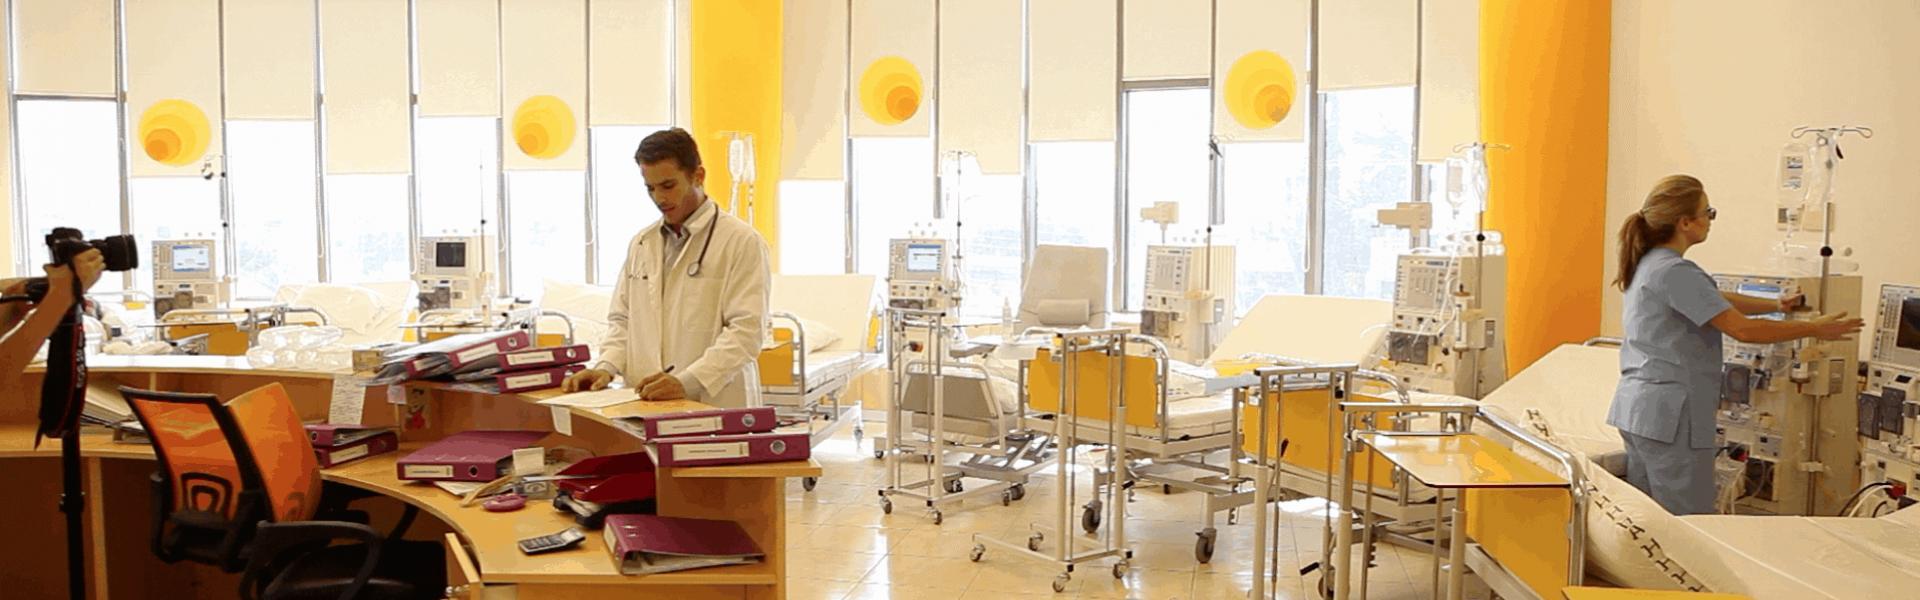 Rontis - Holiday Dialysis Center | Visit Loutraki